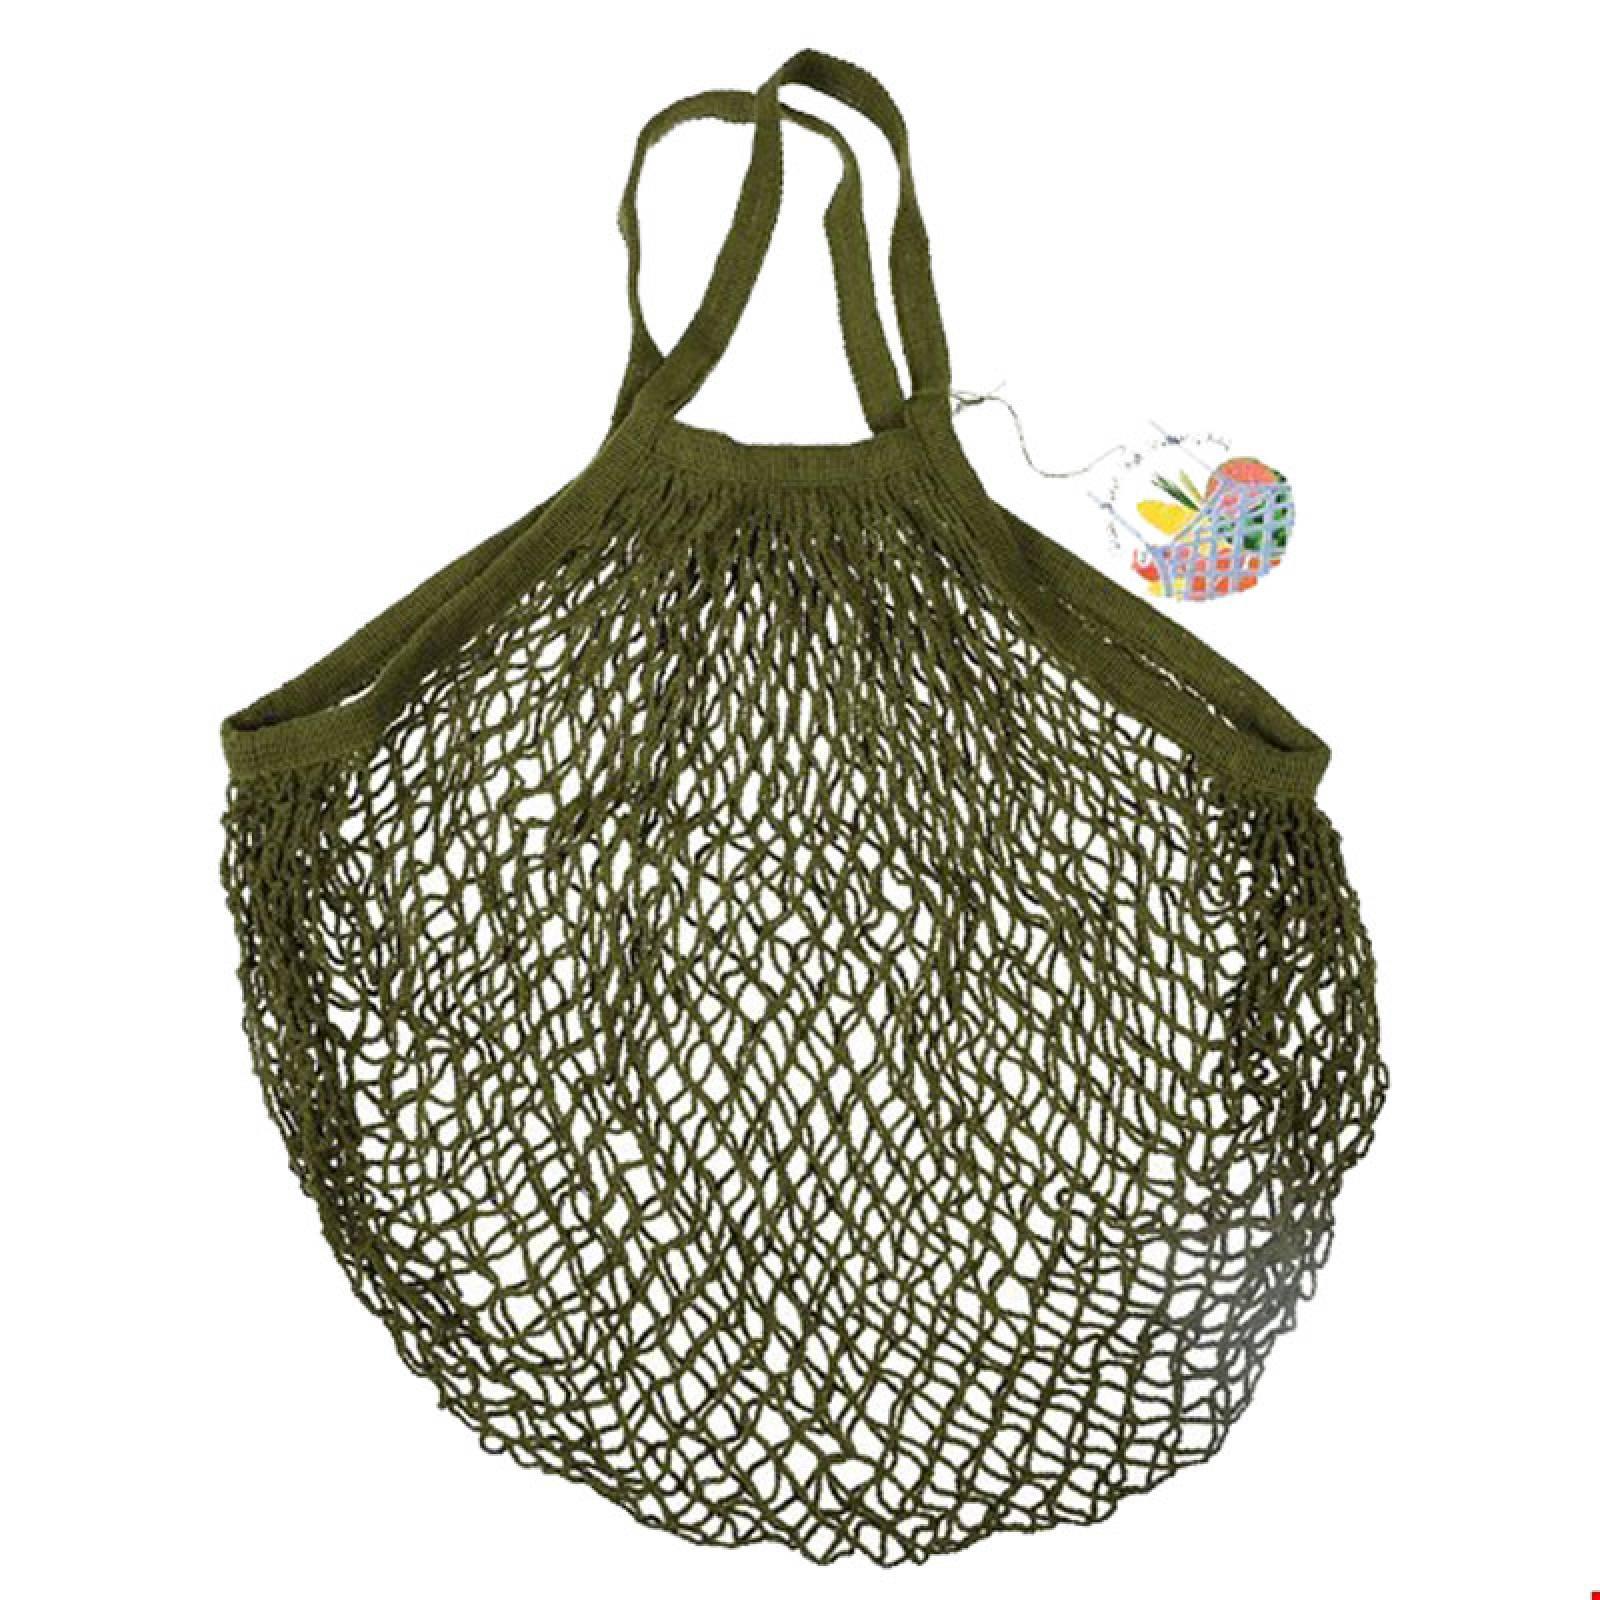 Khaki String Shopping Bag